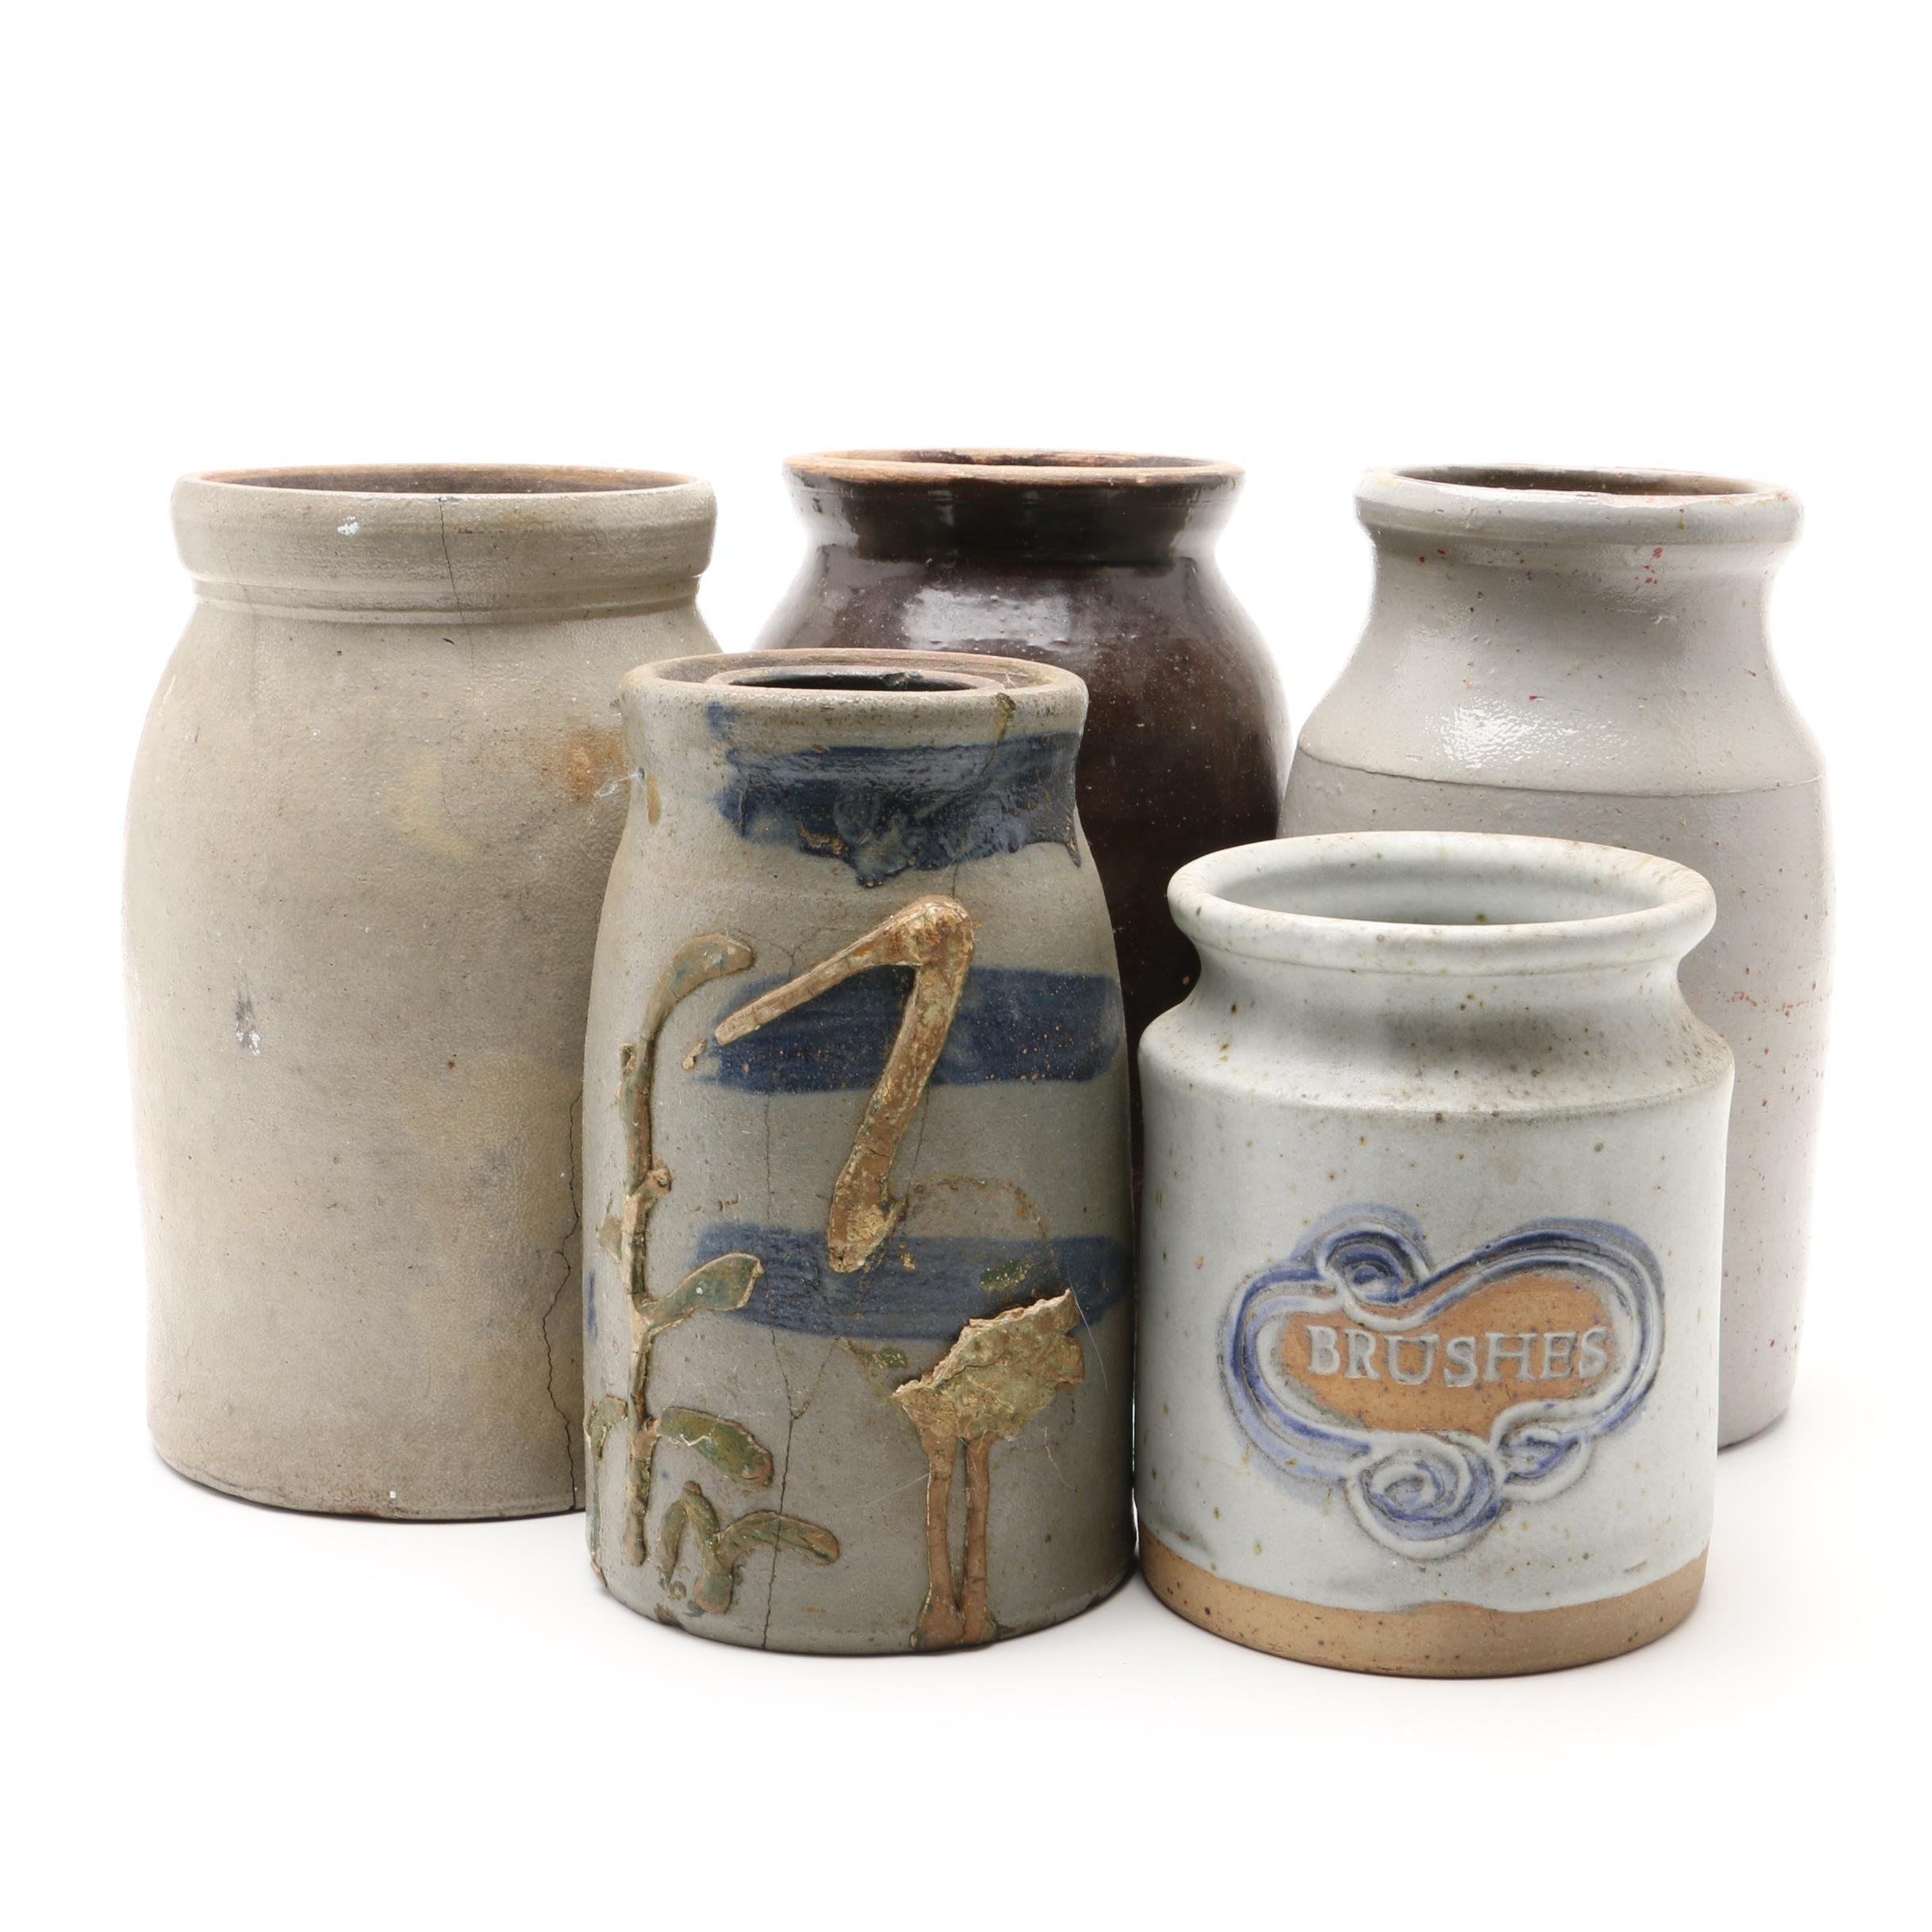 Antique and Modern Stoneware Crocks